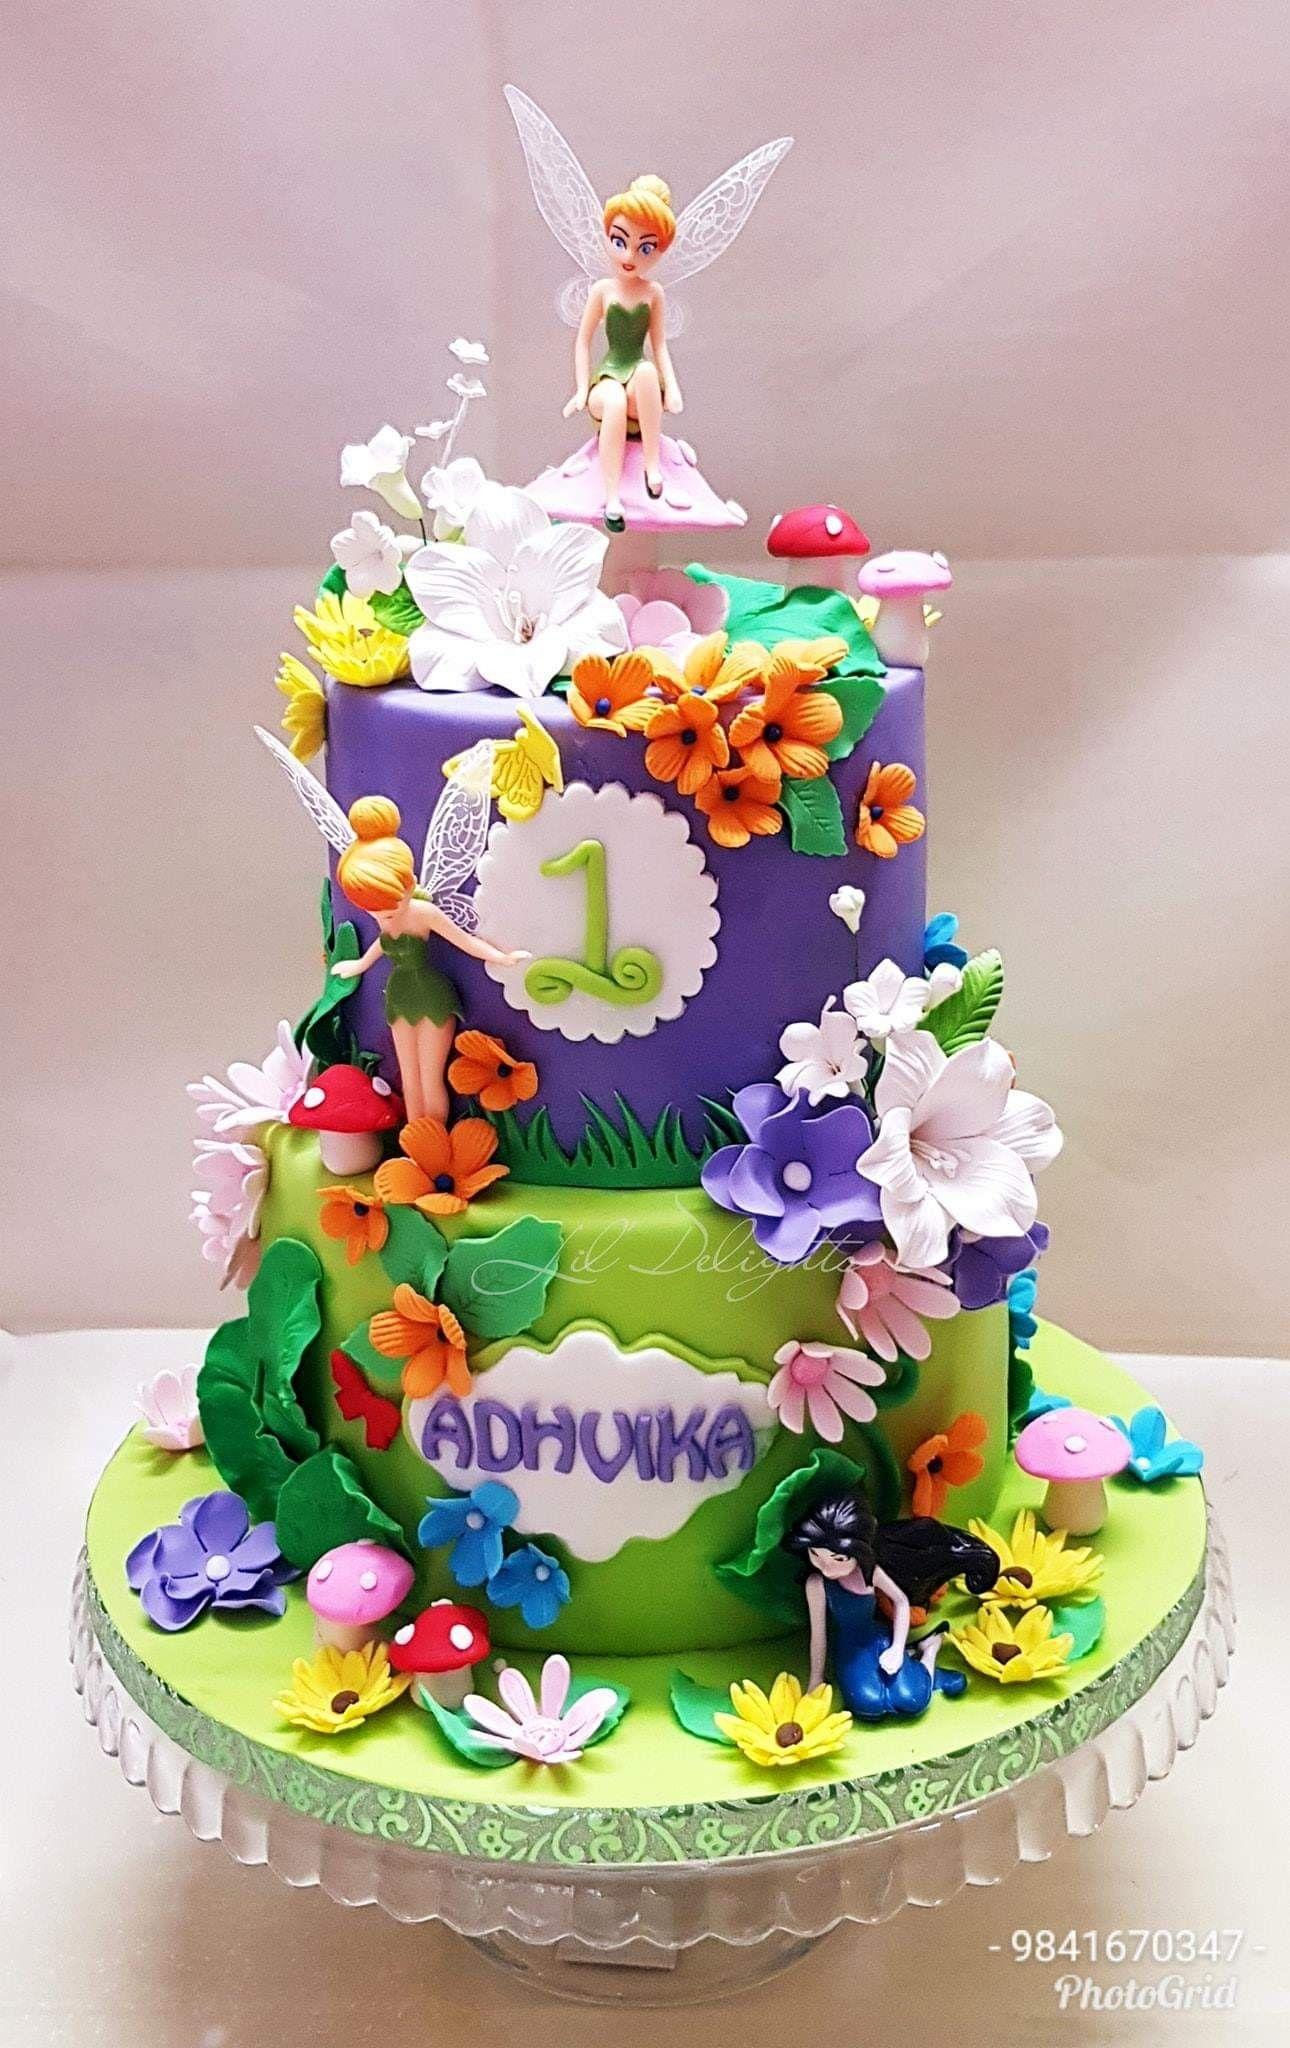 Tinker Bell Cake Fairy Theme Cake A Fairy Cake For Lil Adhvika For Her 1st Birthday A Cak Tinkerbell Cake Tinkerbell Birthday Cakes Fairy Birthday Cake